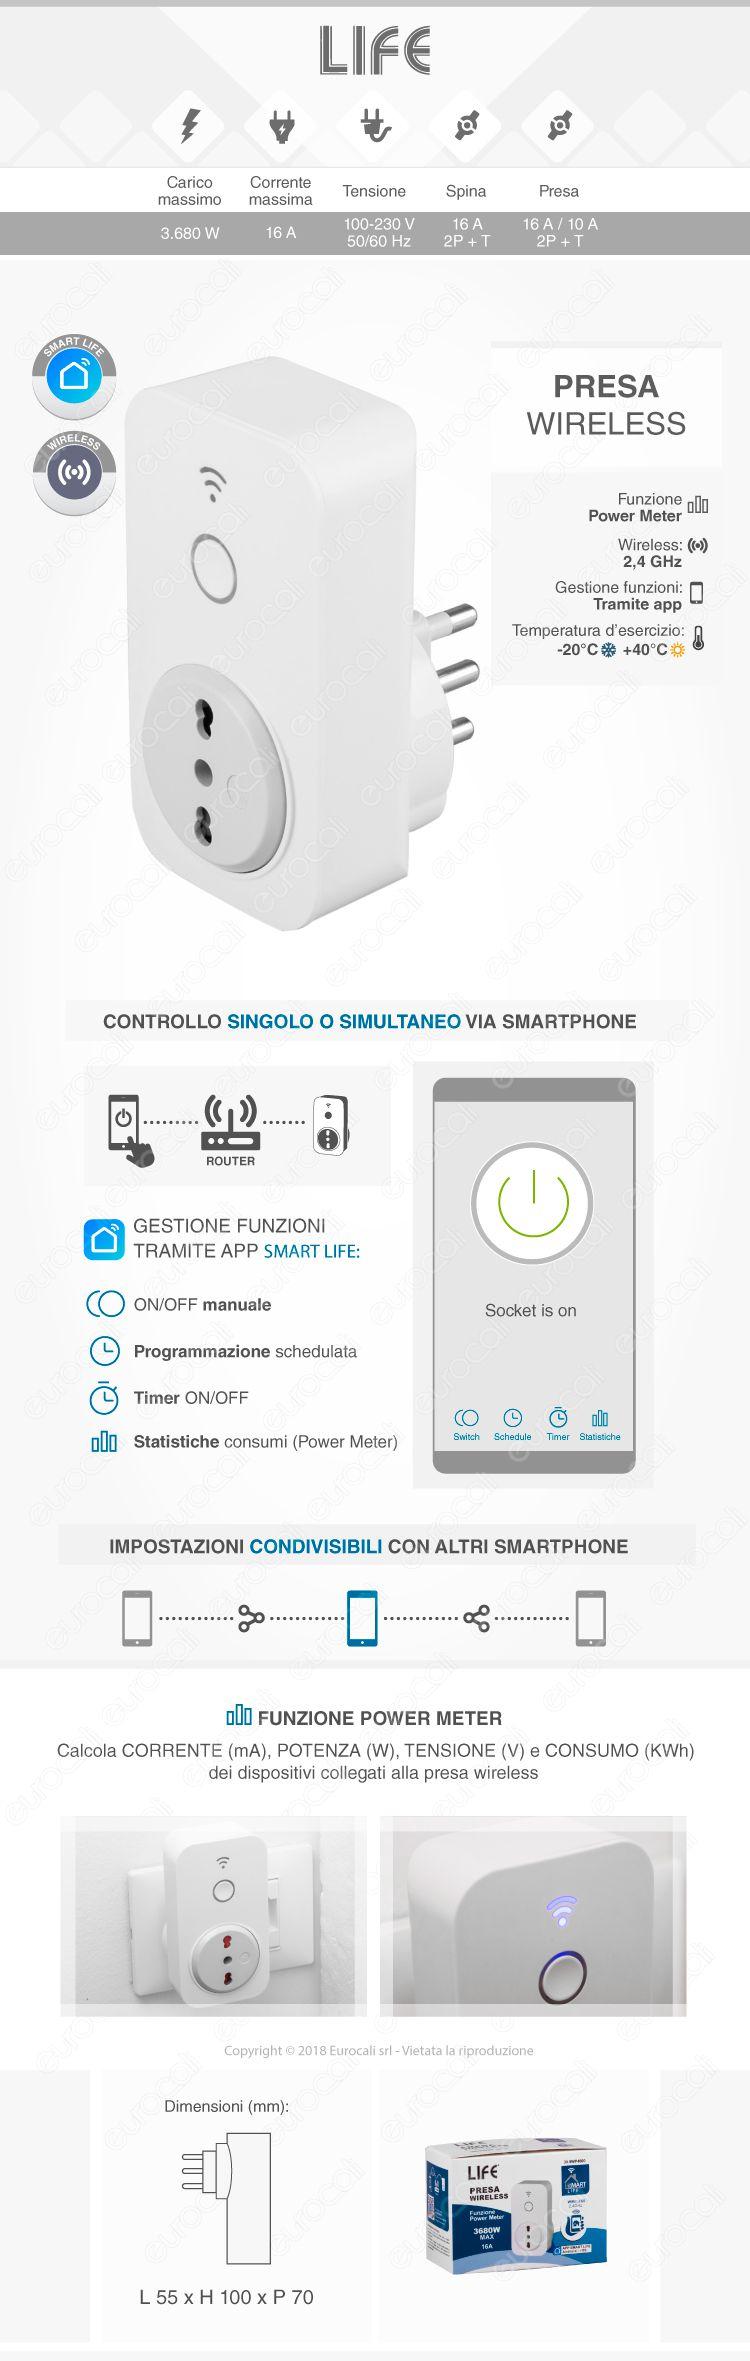 life smart life presa wireless 16a+t